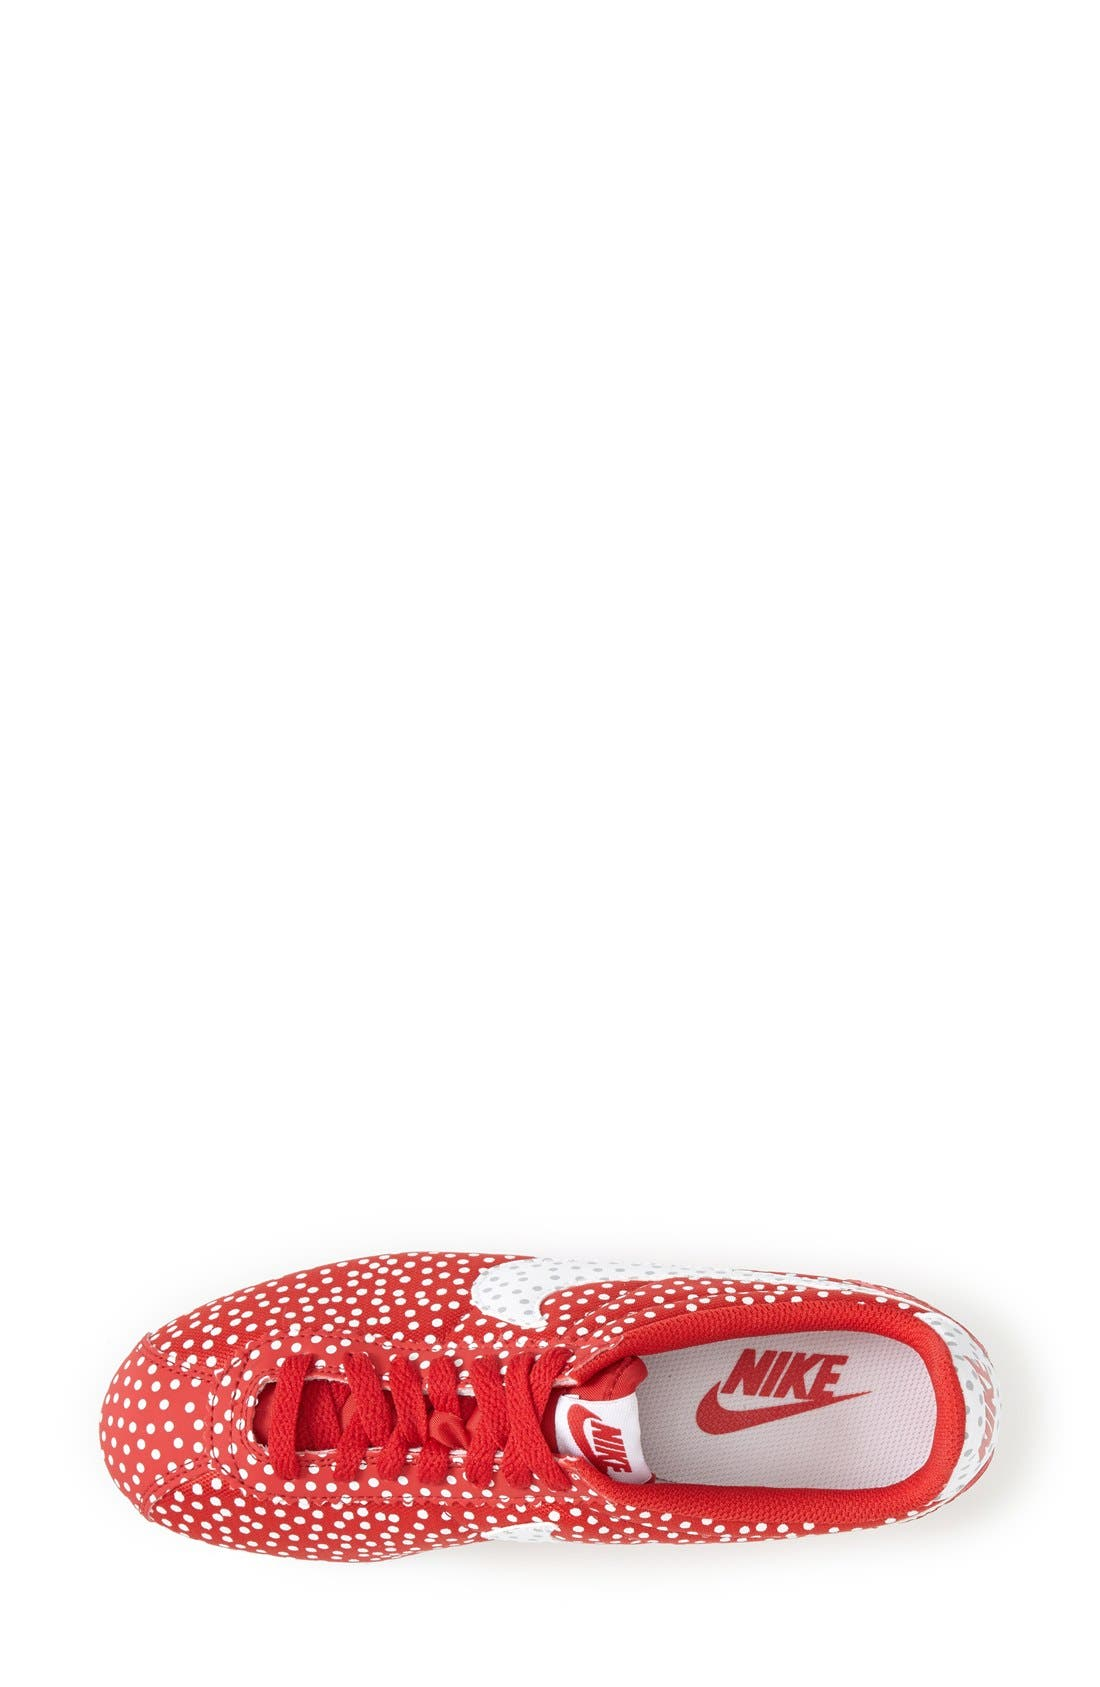 Alternate Image 3  - Nike 'Cortez - Polka Dot Print' Sneaker (Women)